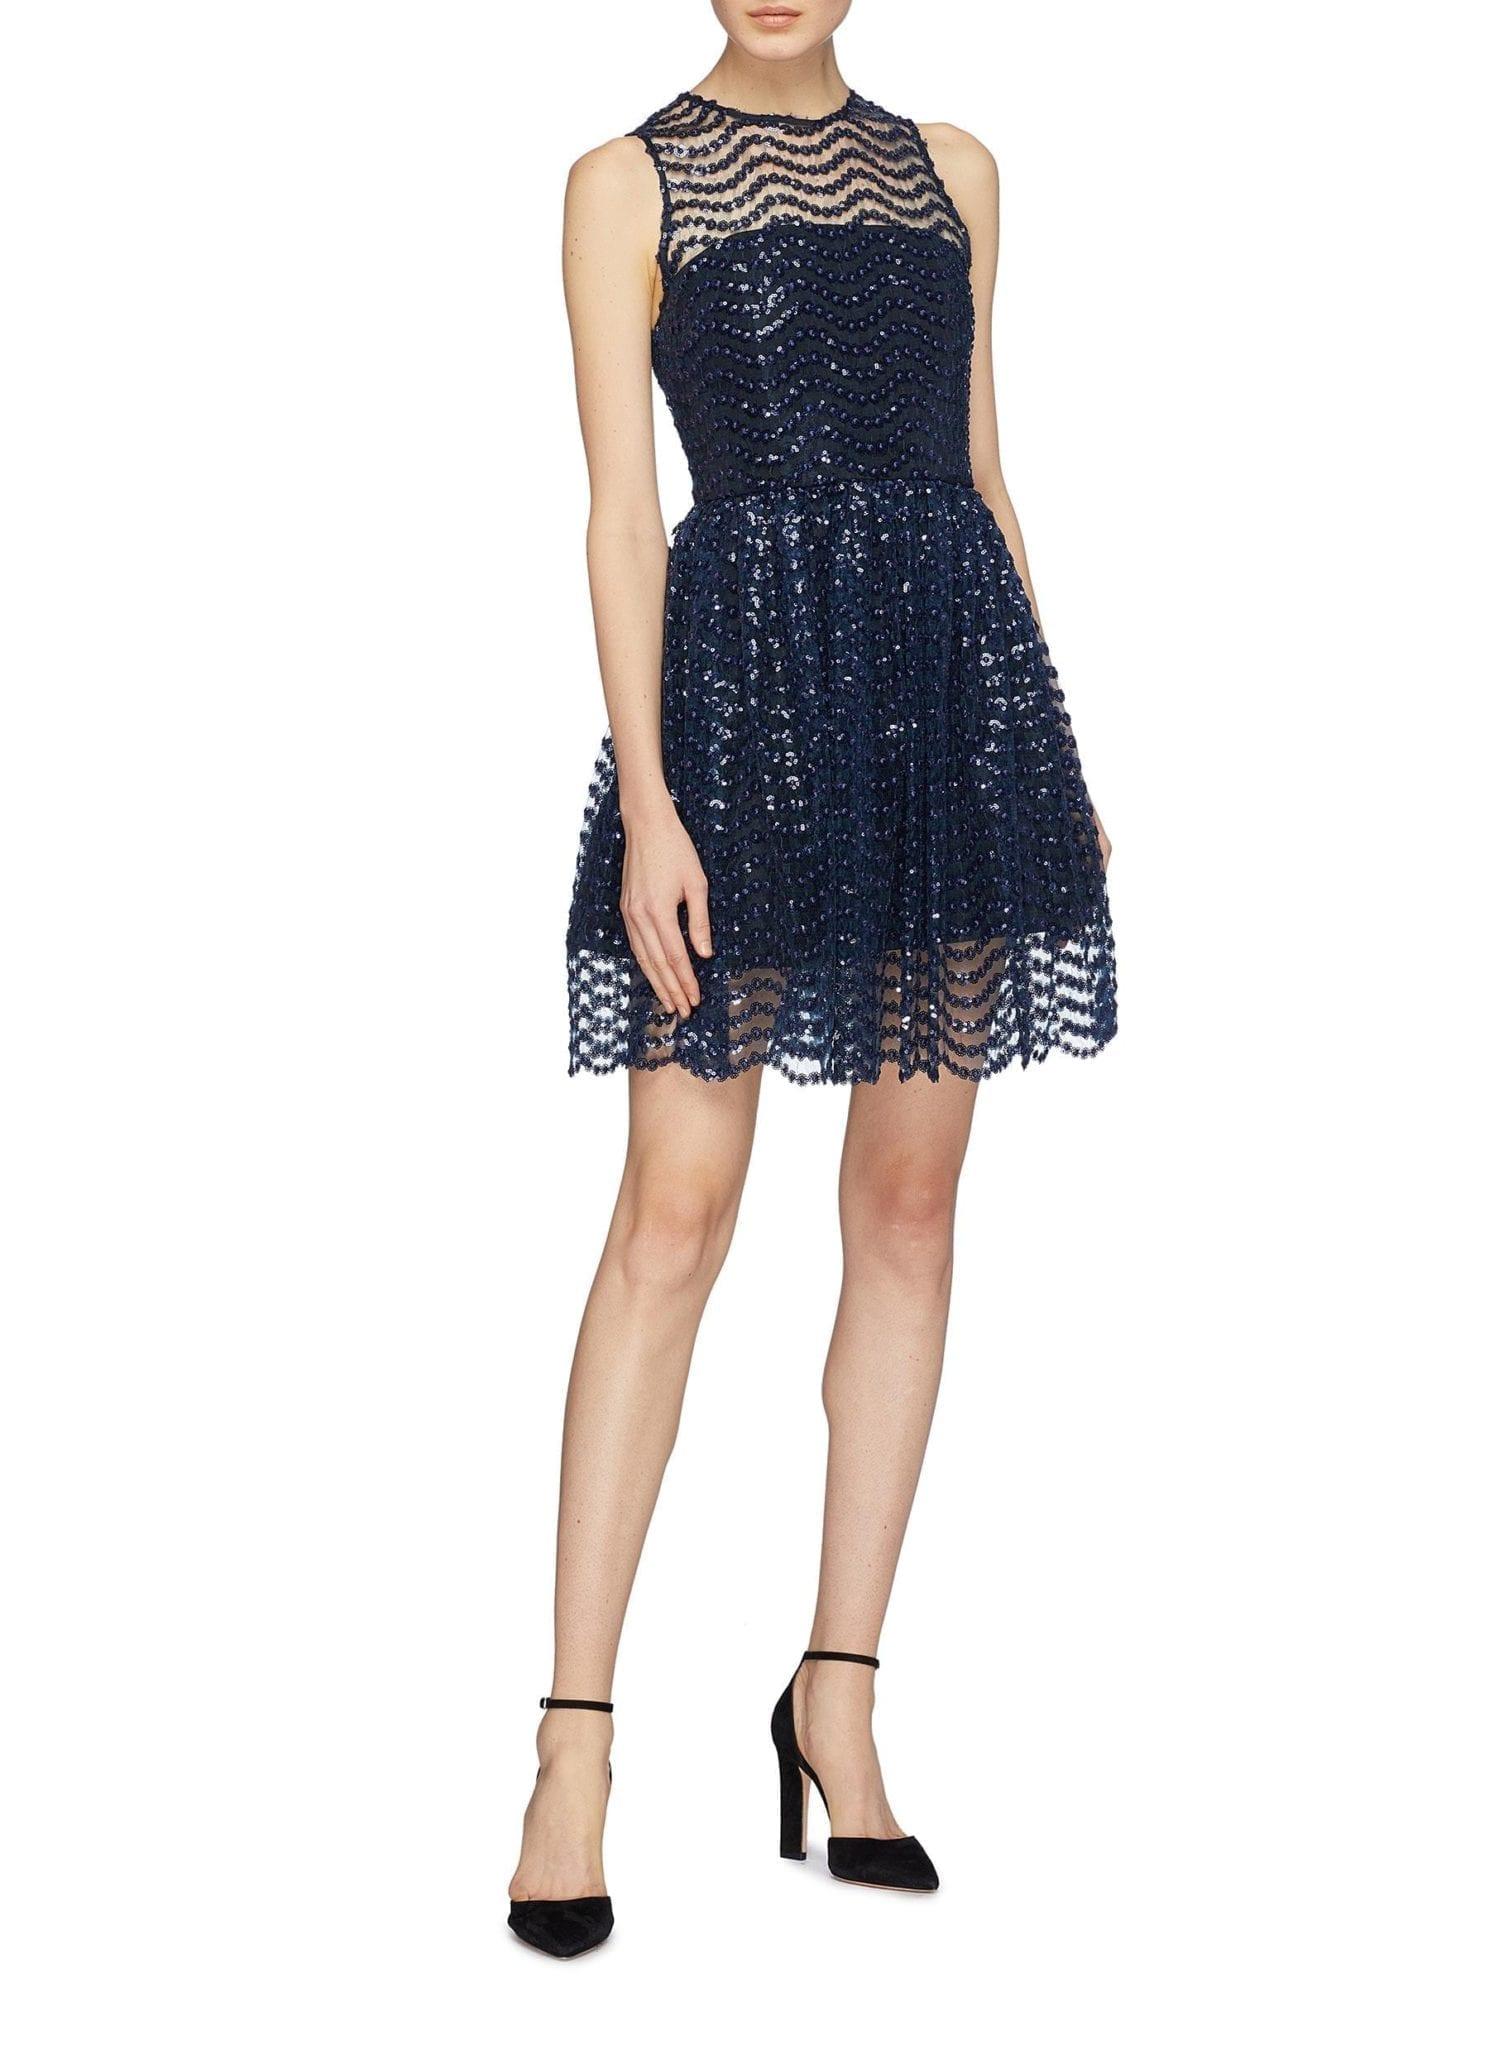 0327c3dc2870 ALICE + OLIVIA  daisy  Wavy Sequin Stripe Navy Dress - We Select Dresses